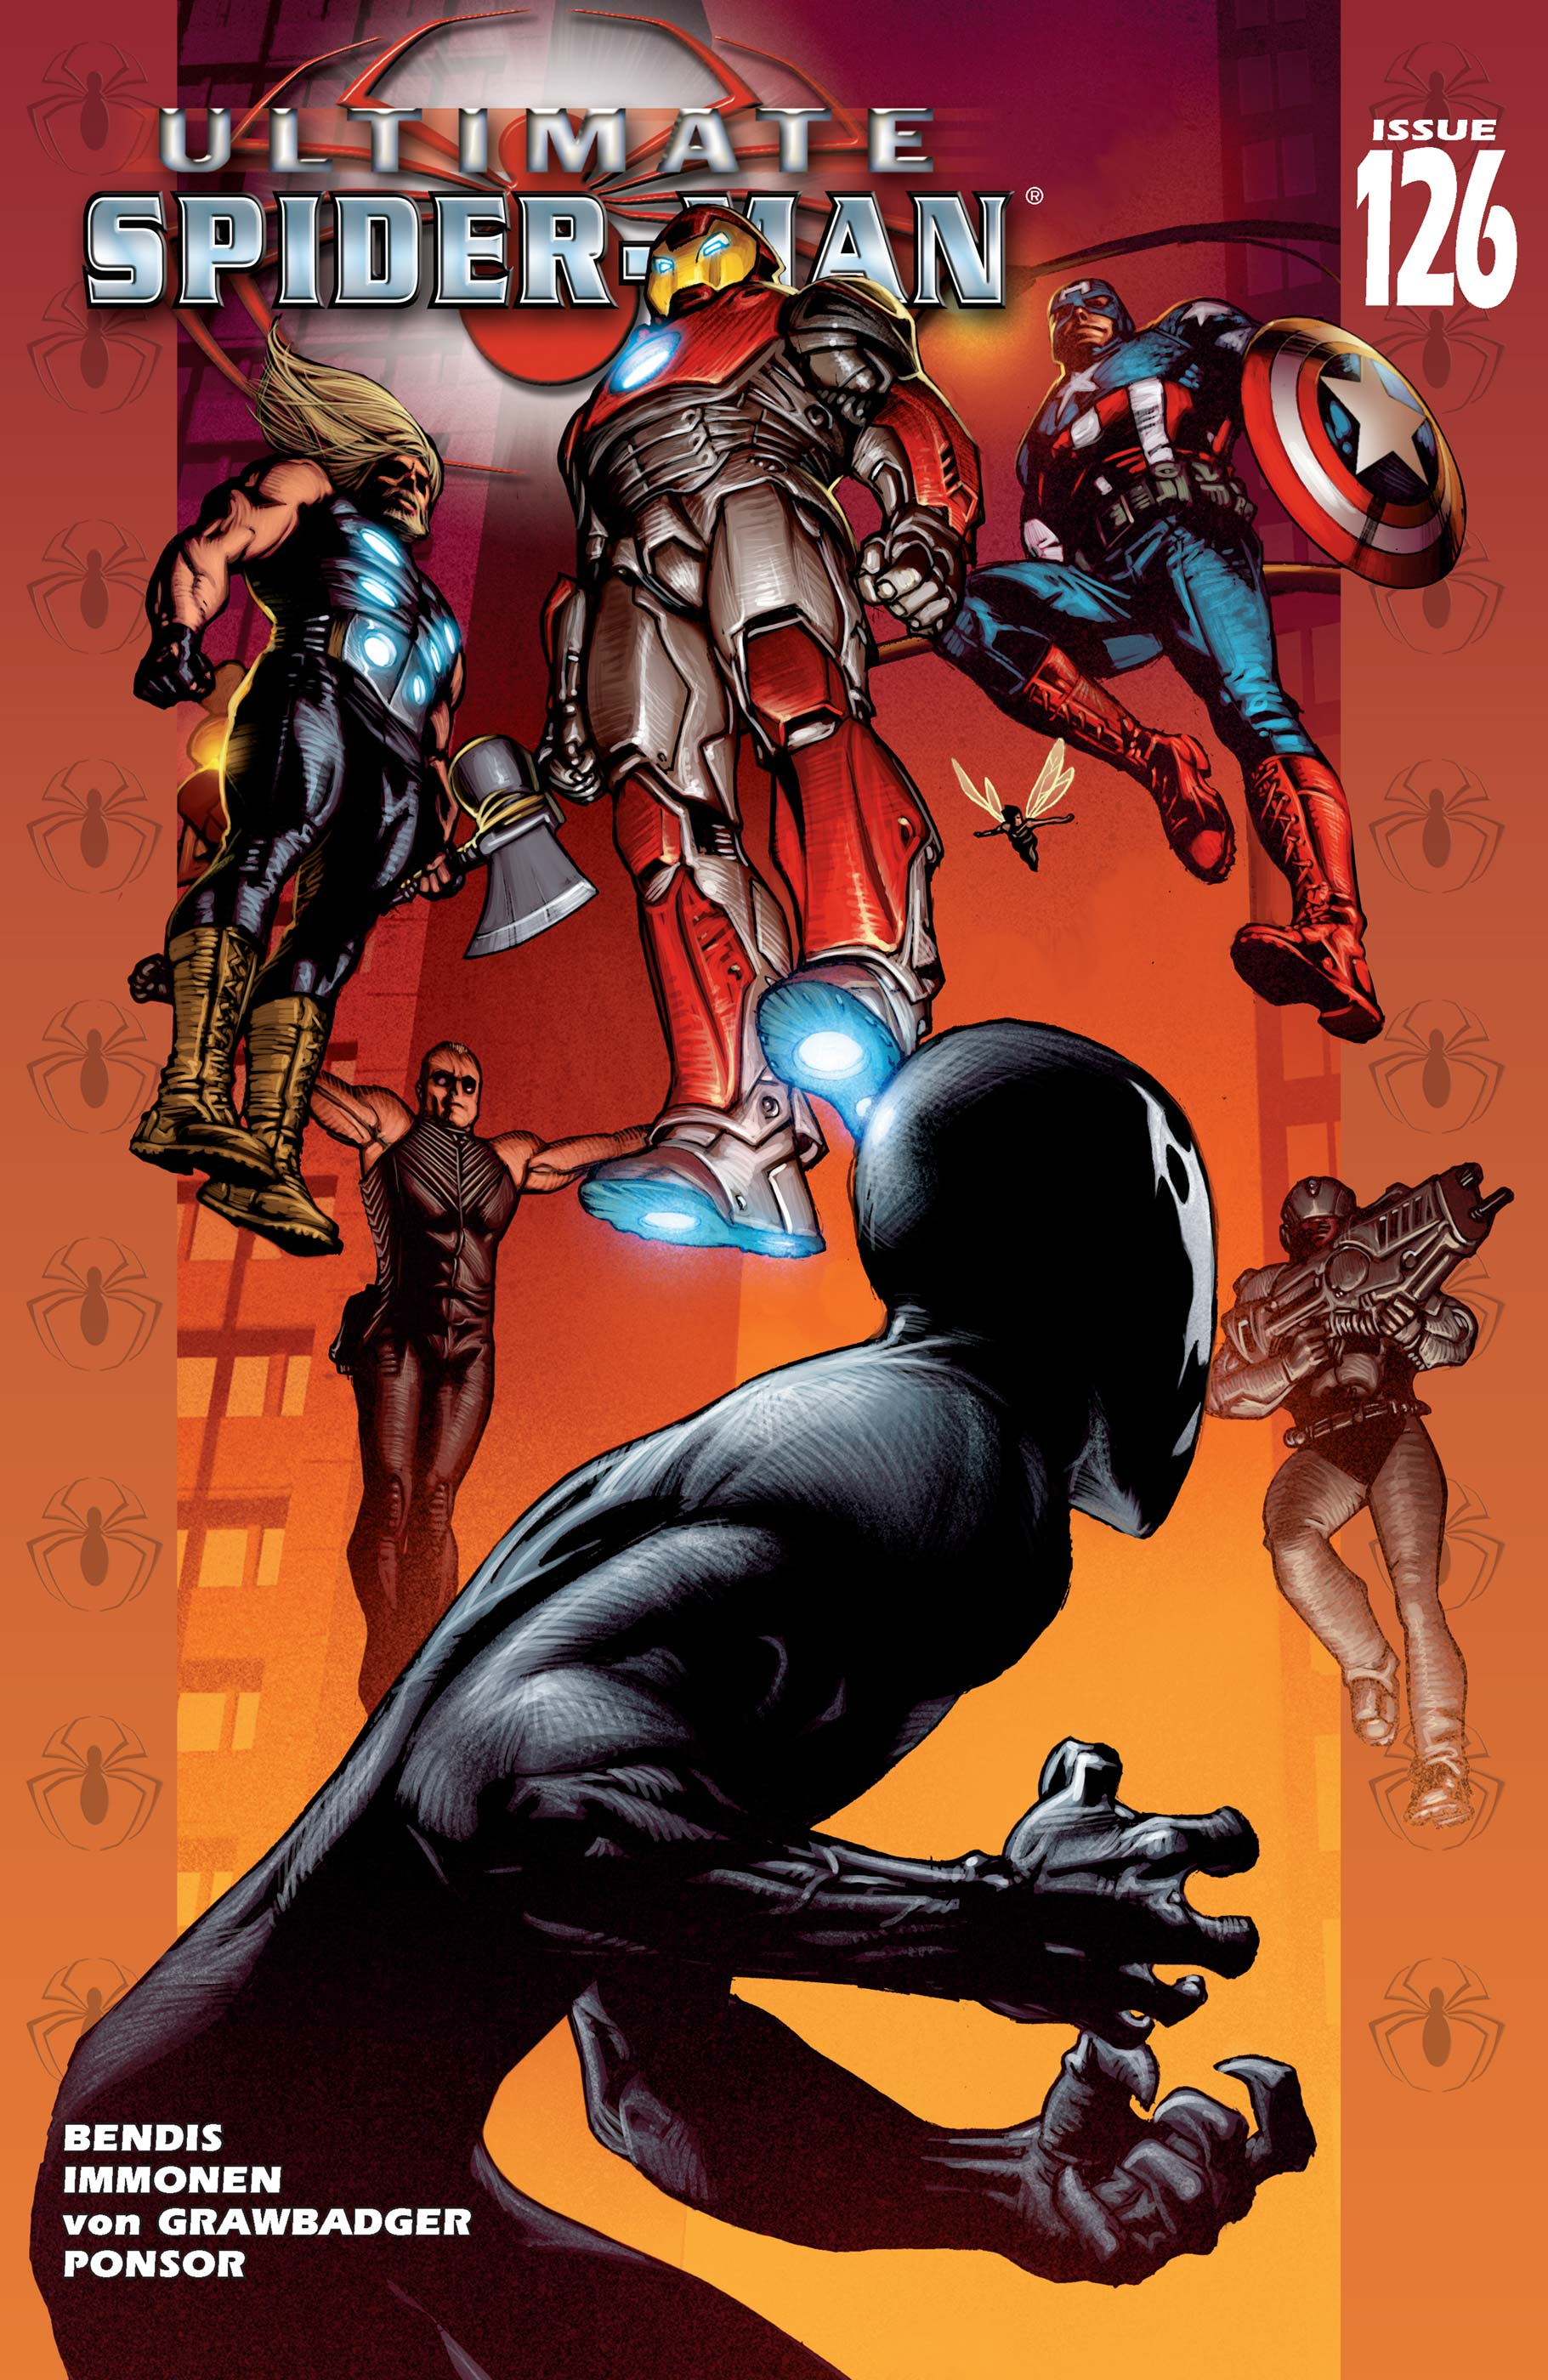 Ultimate Spider-Man (2000) #126